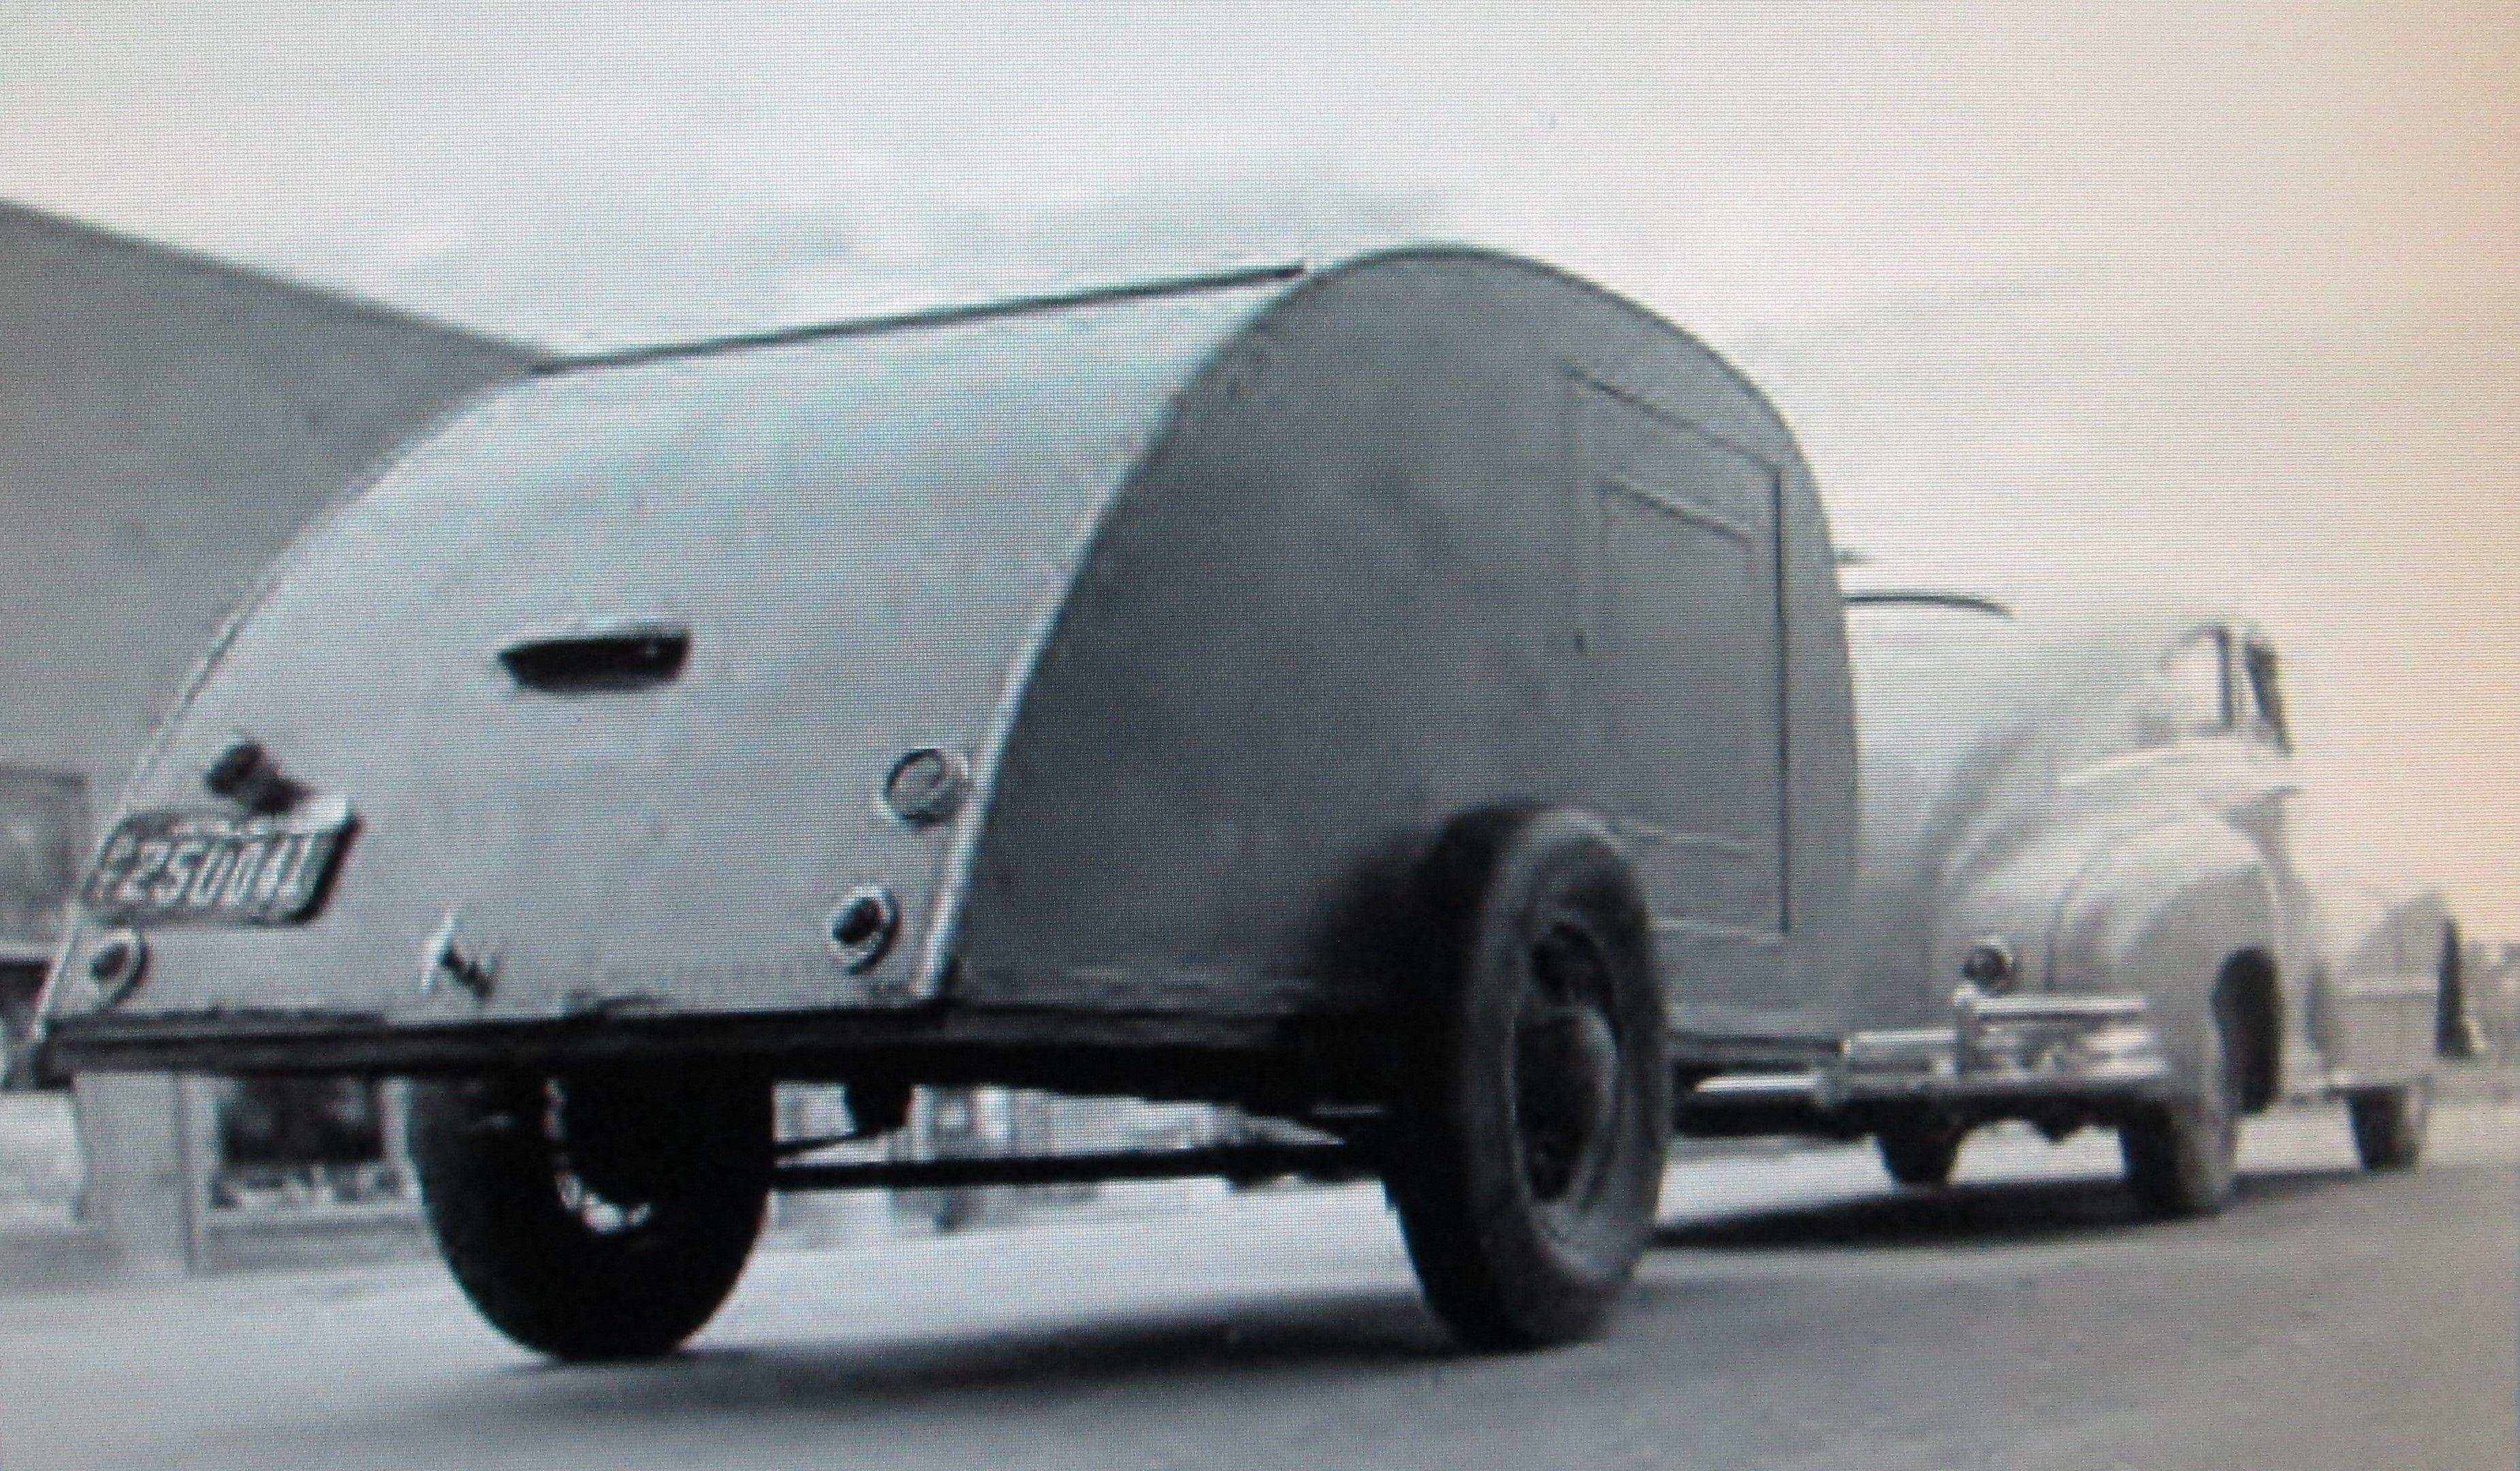 Worm s eye view of a 1940 s era teardrop trailer Man I wish I could